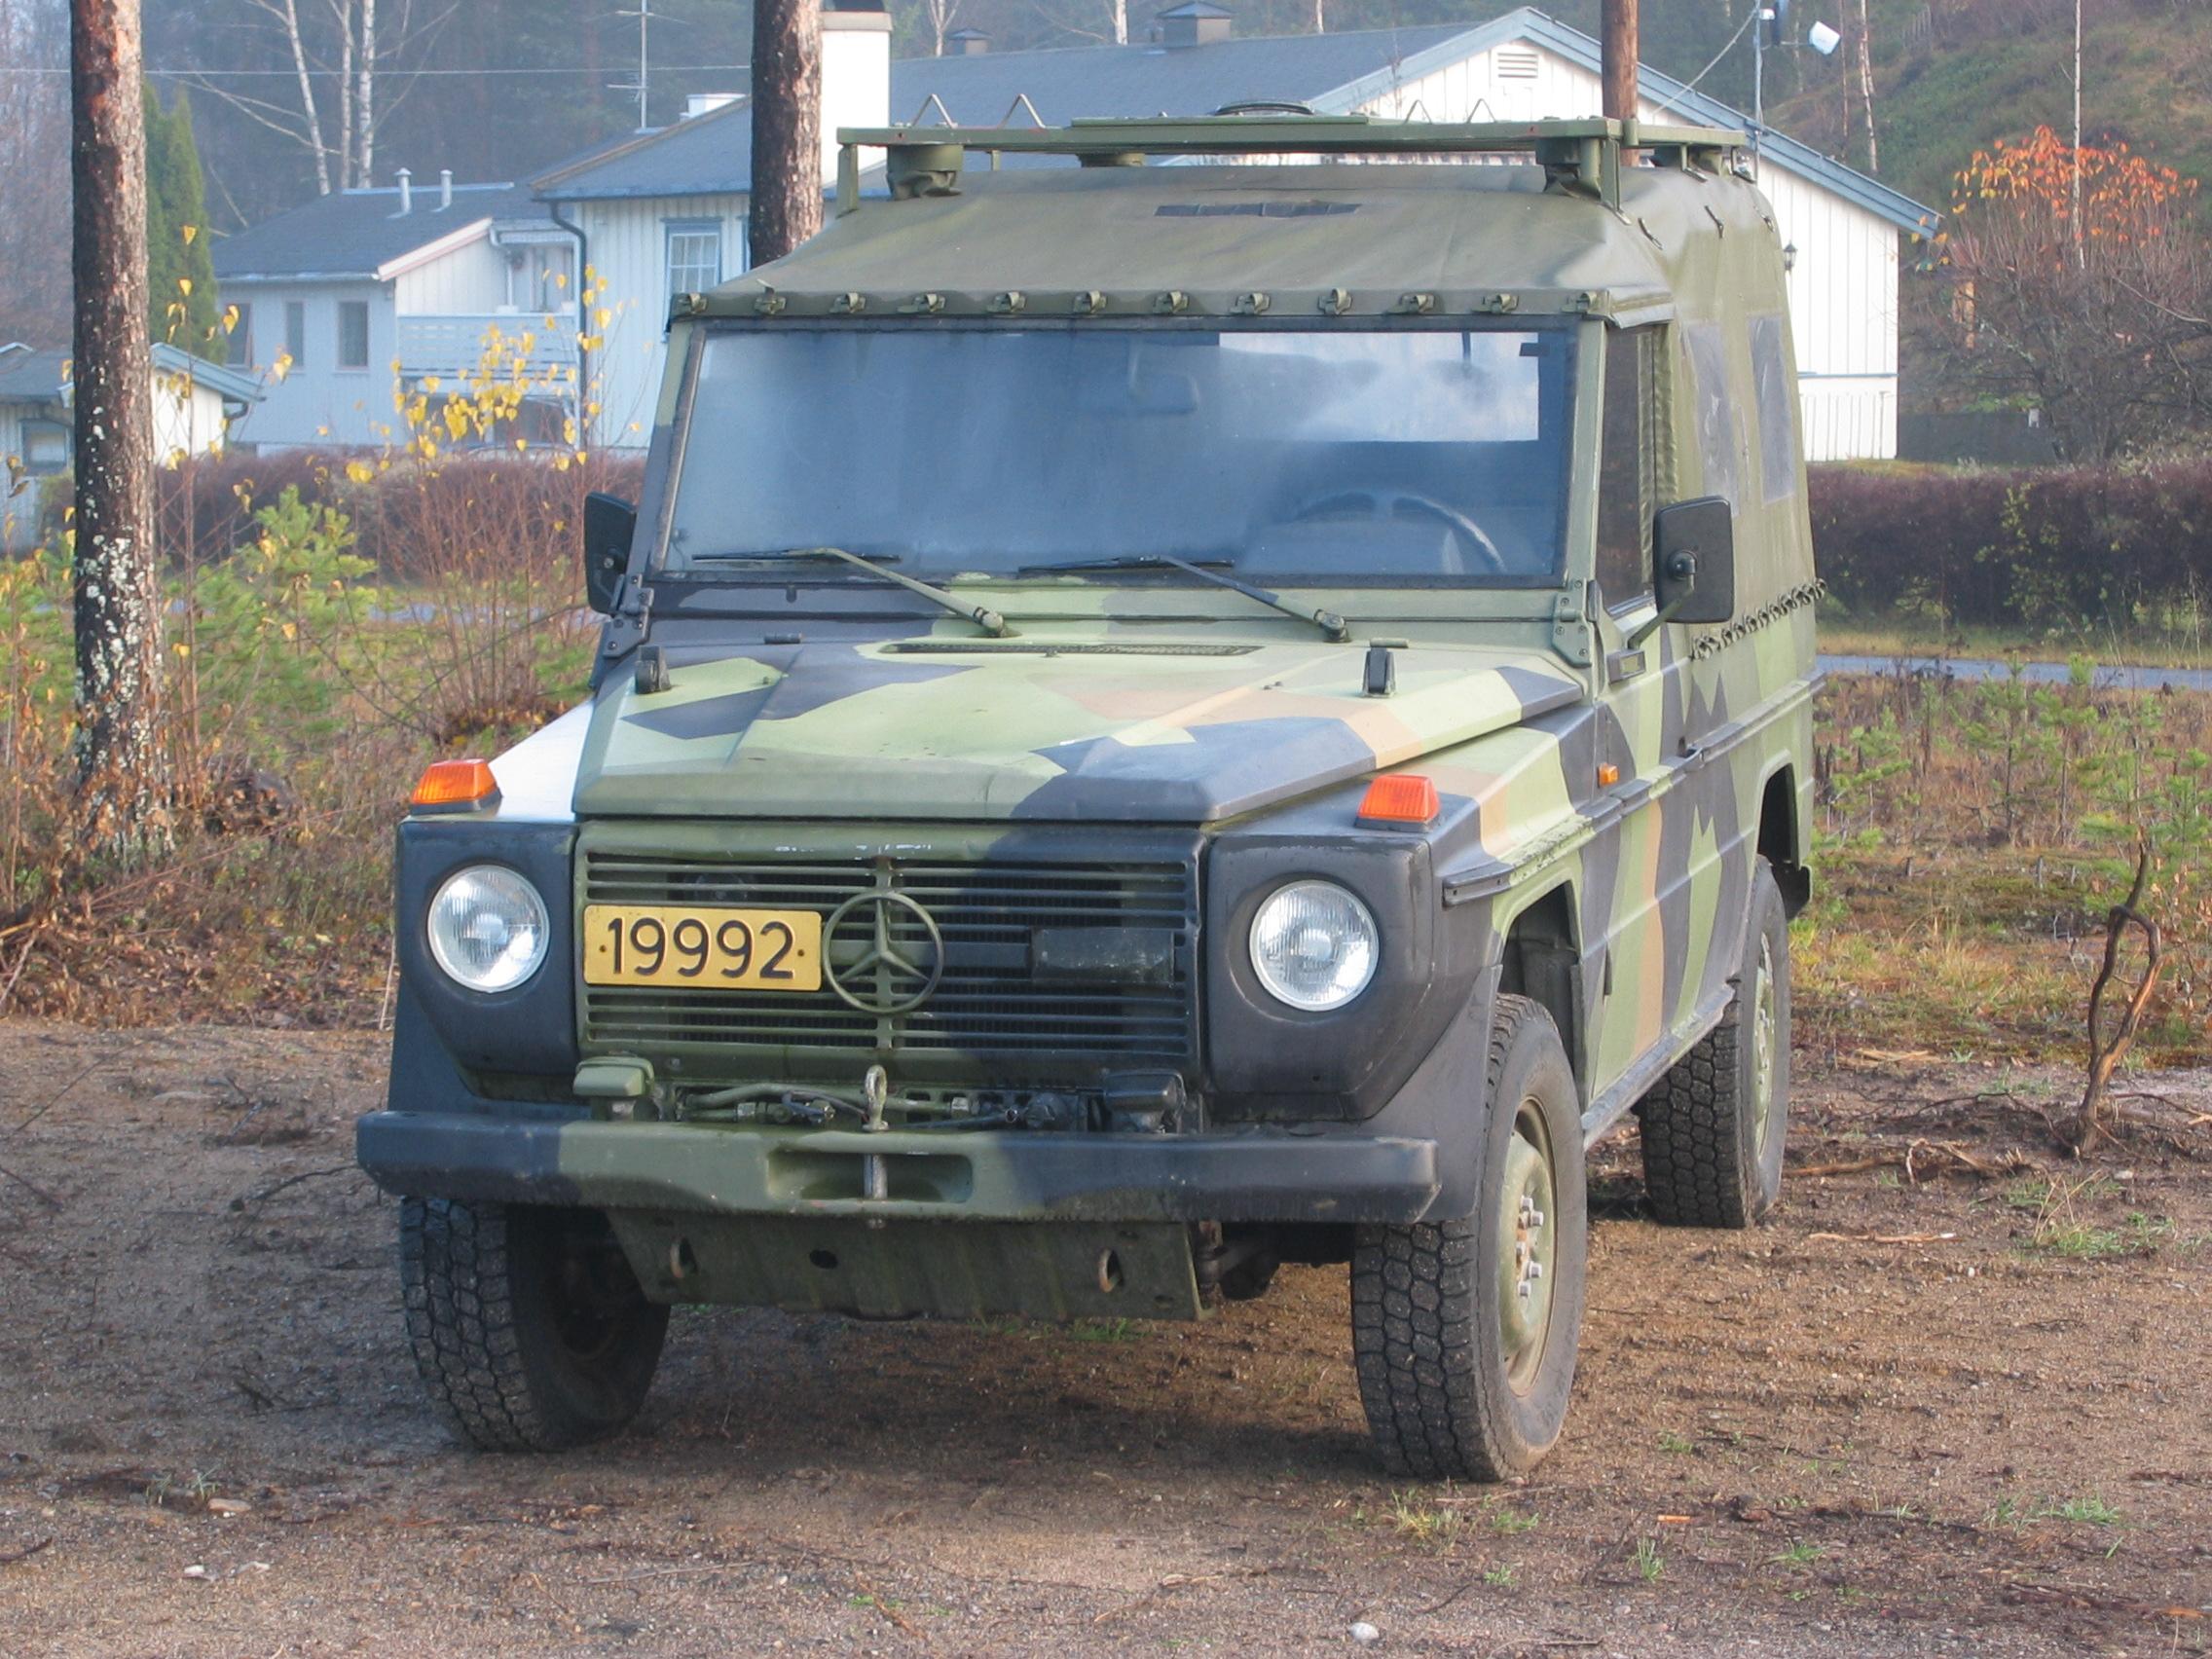 datei:mercedes-benz geländewagen norwegian miltary mb240gd fq2